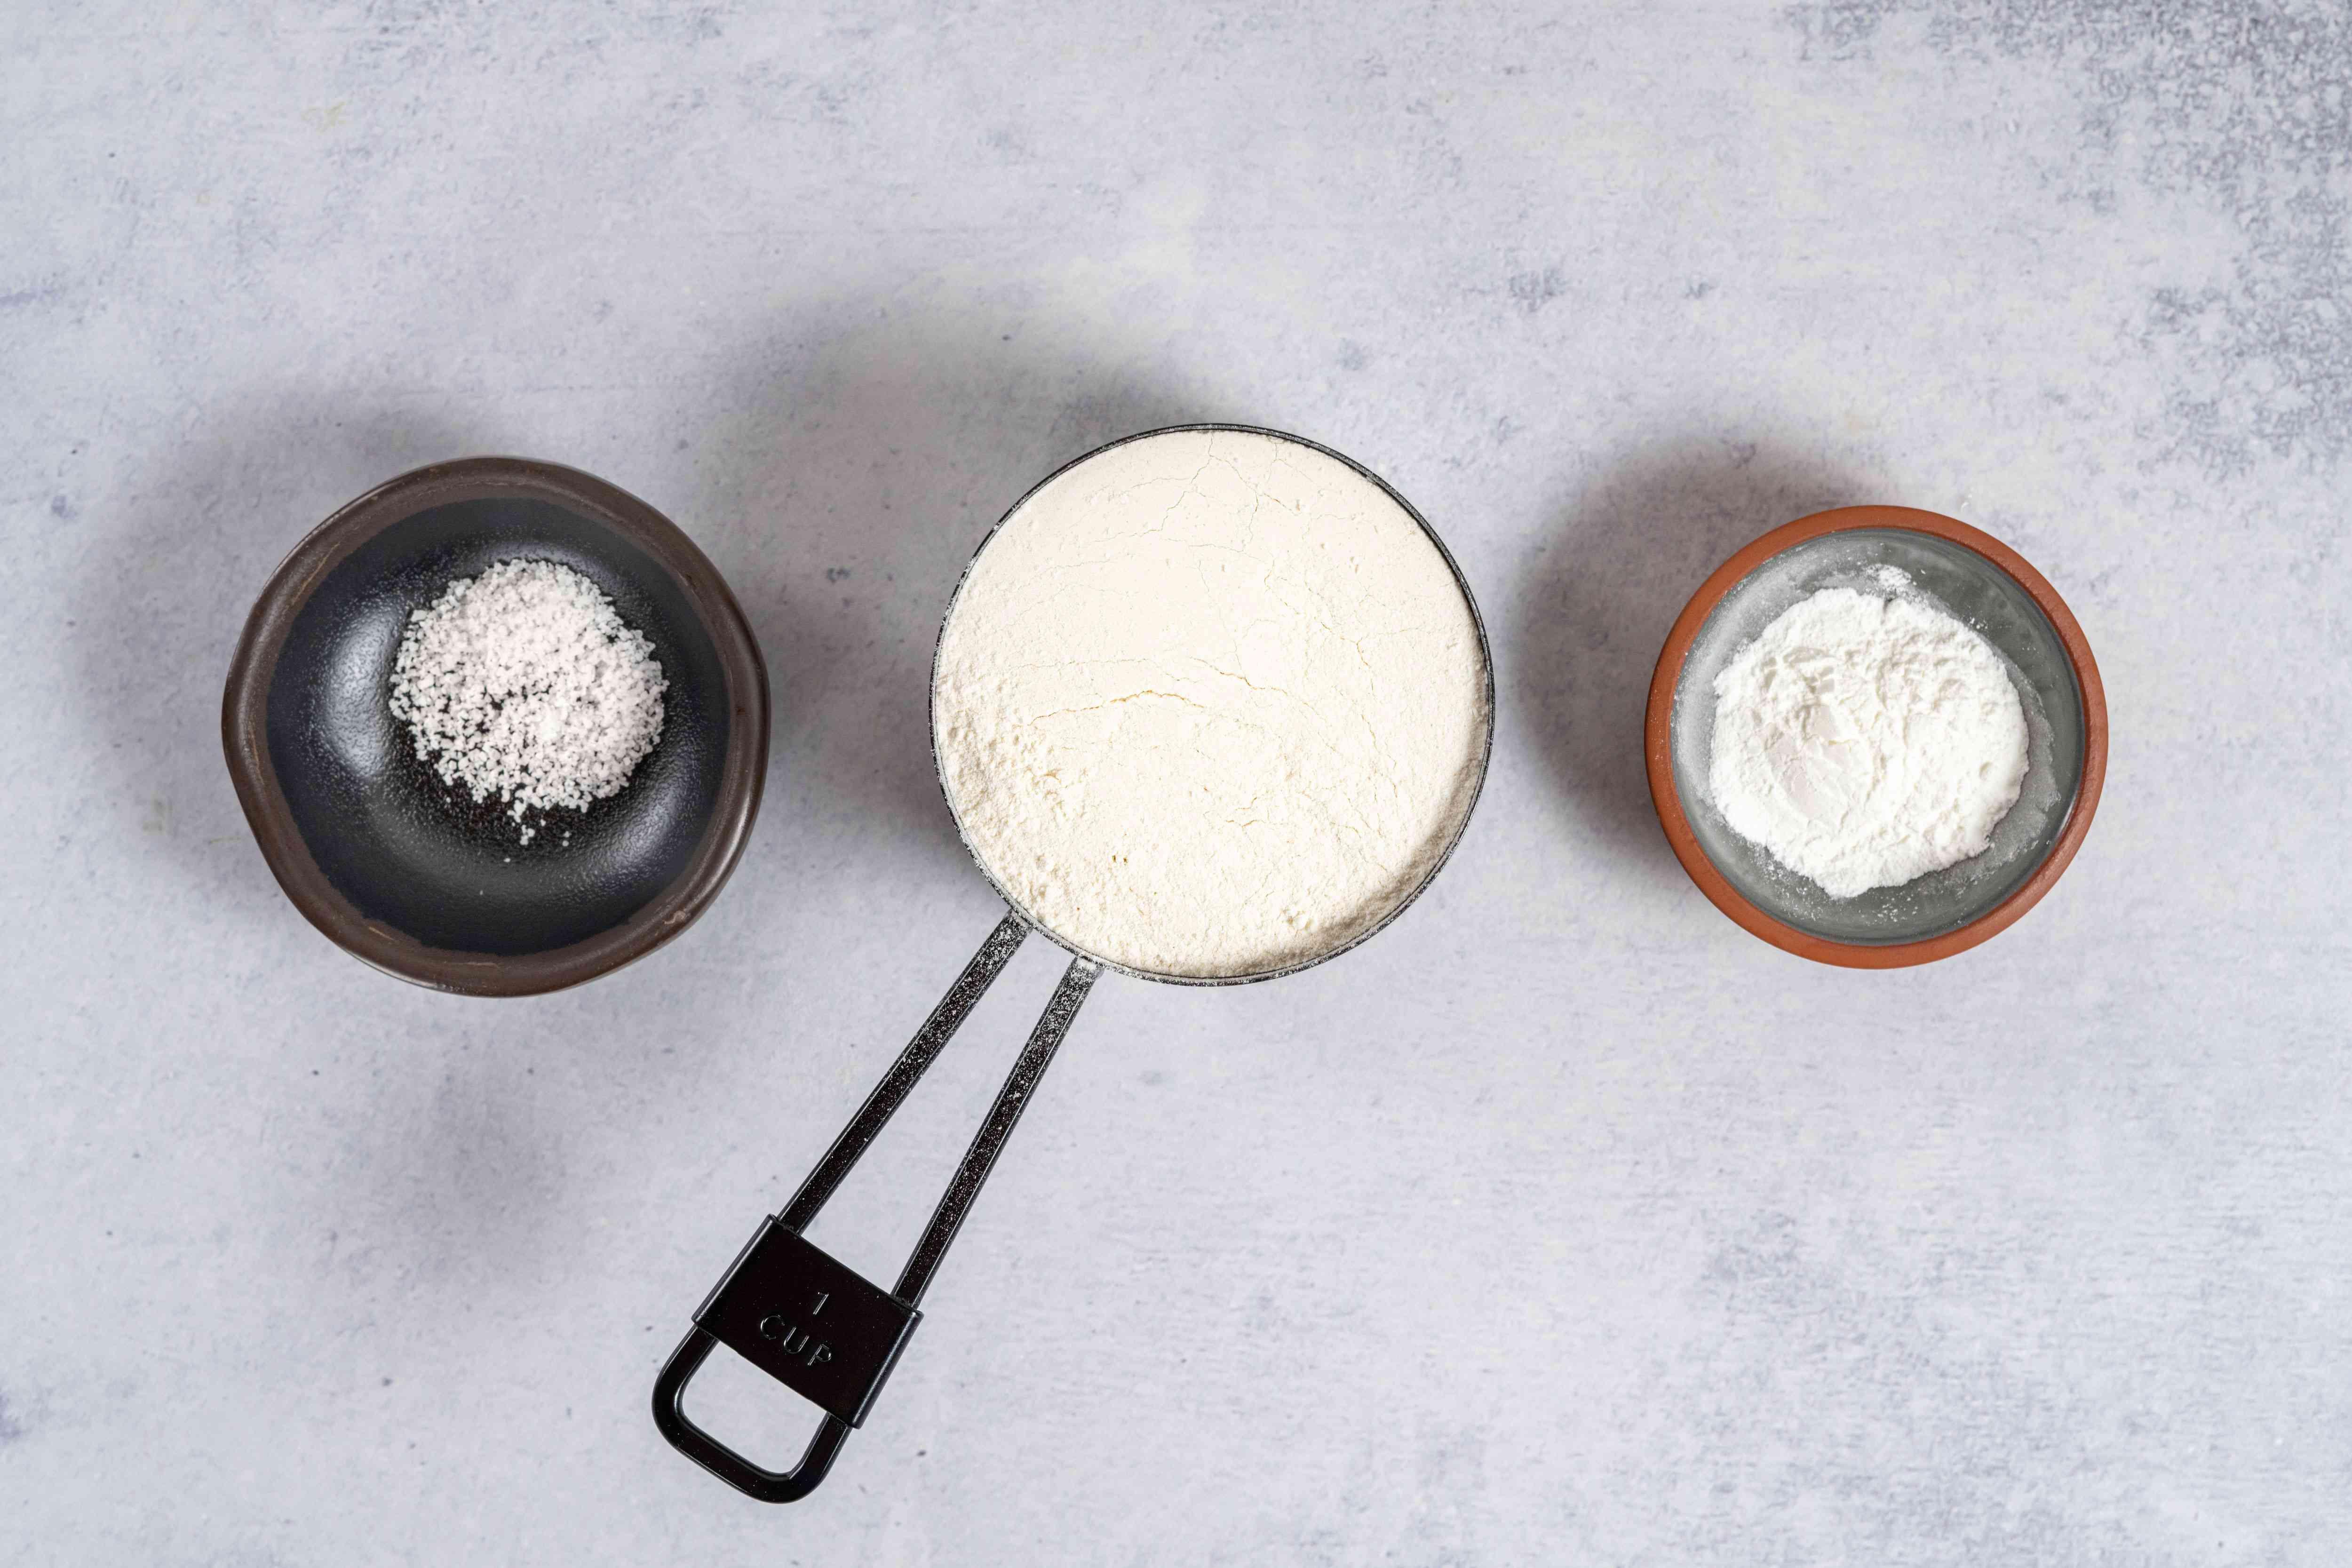 Self-Rising Flour ingredients